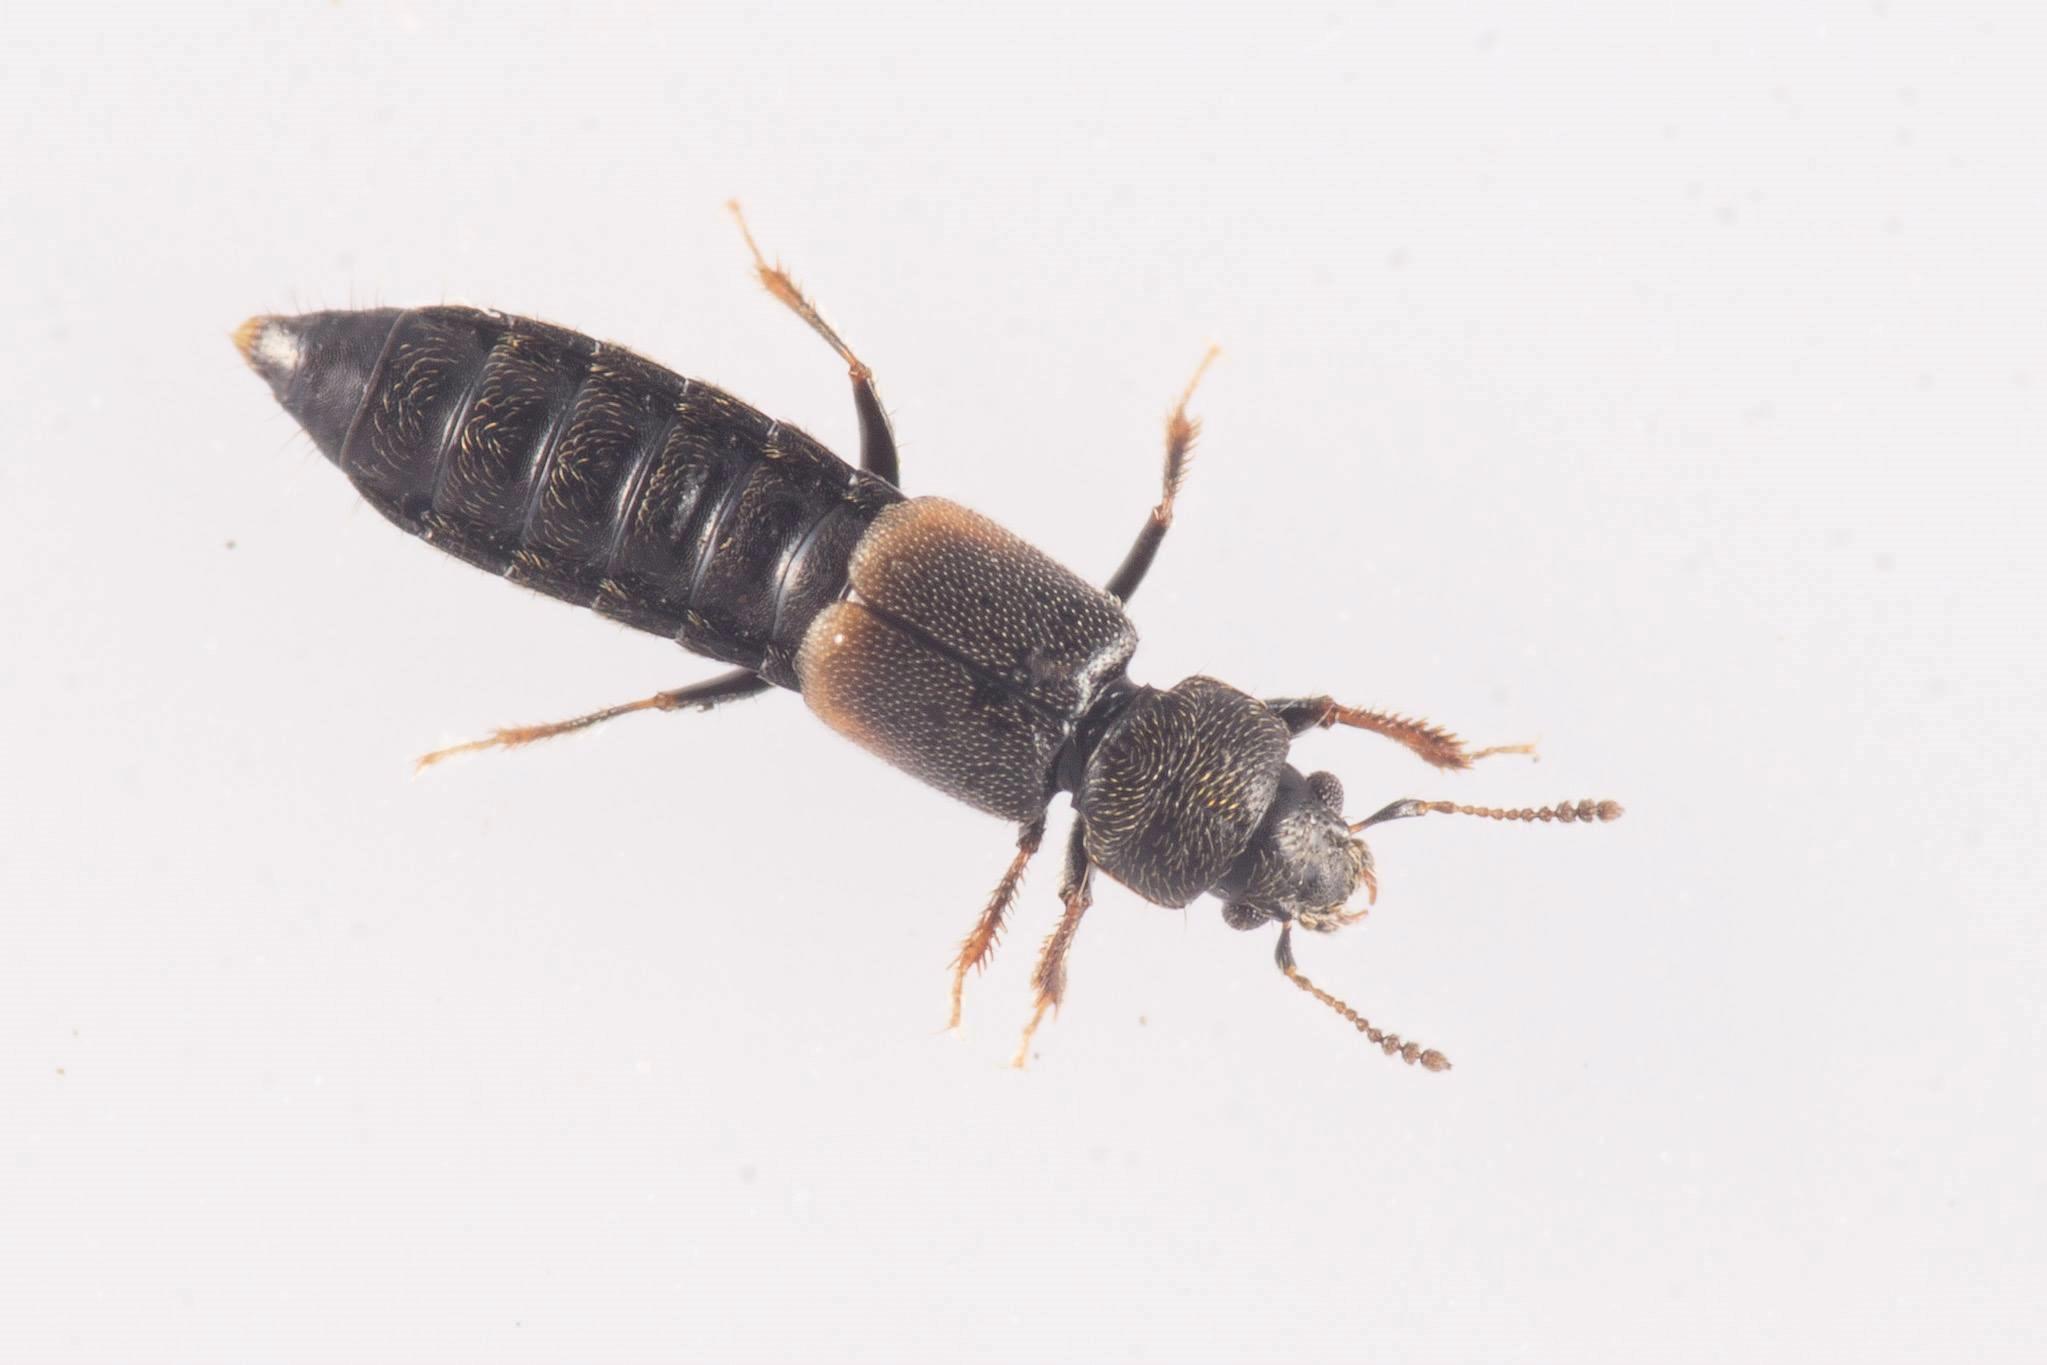 Bledius subniger